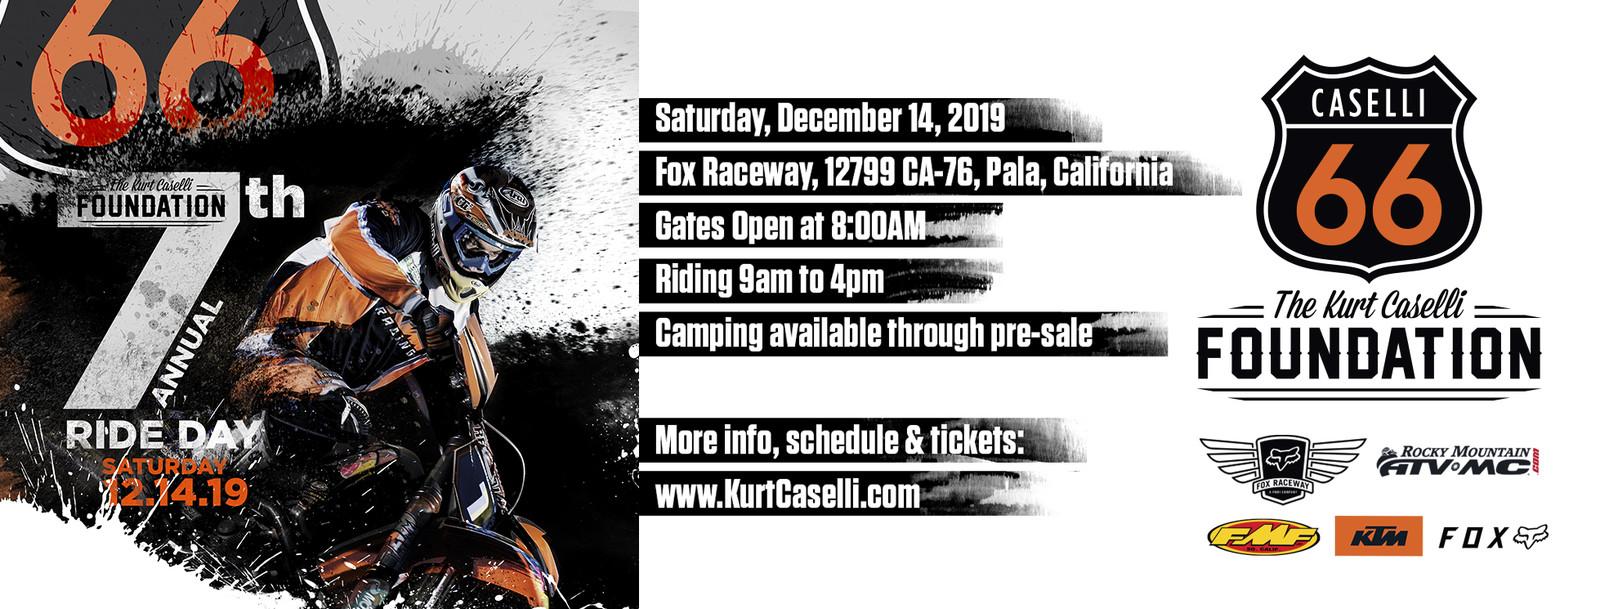 7th Annual Kurt Caselli Ride Day Details